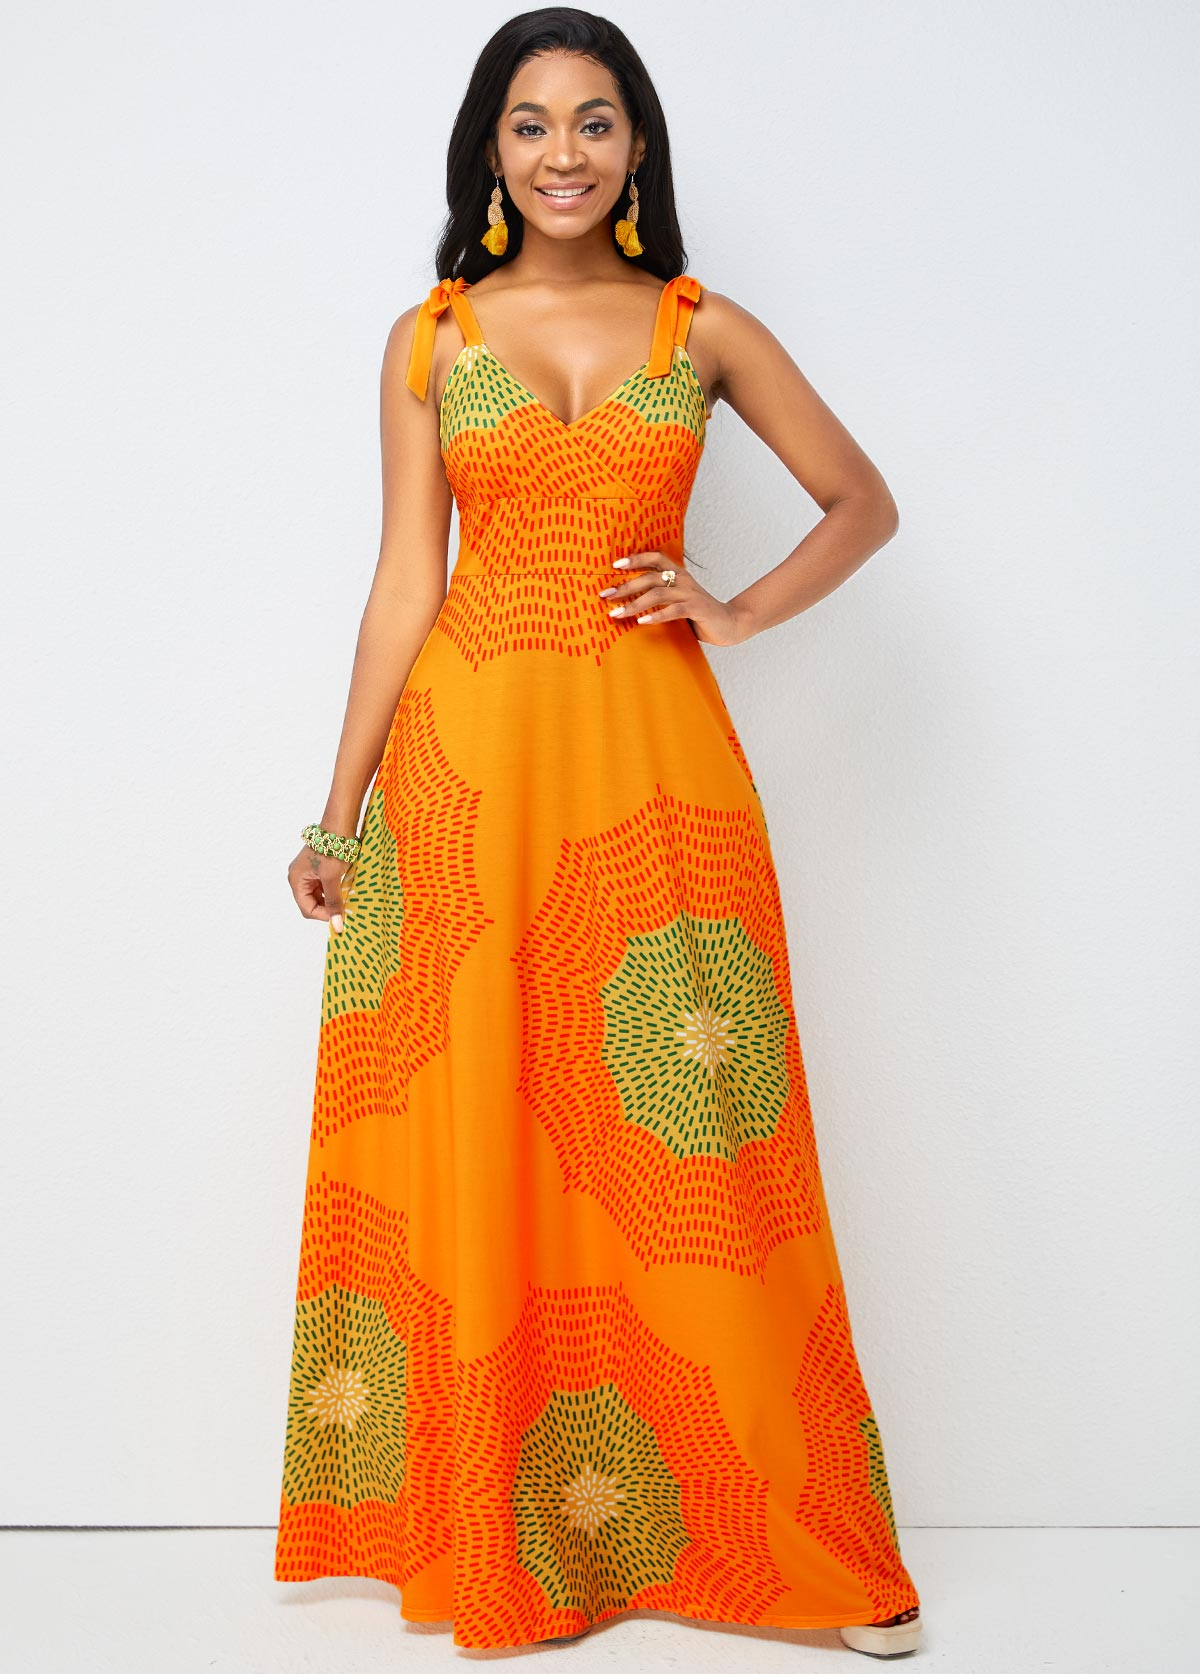 ROTITA Tie Shoulder Geometric Print Spaghetti Strap Dress